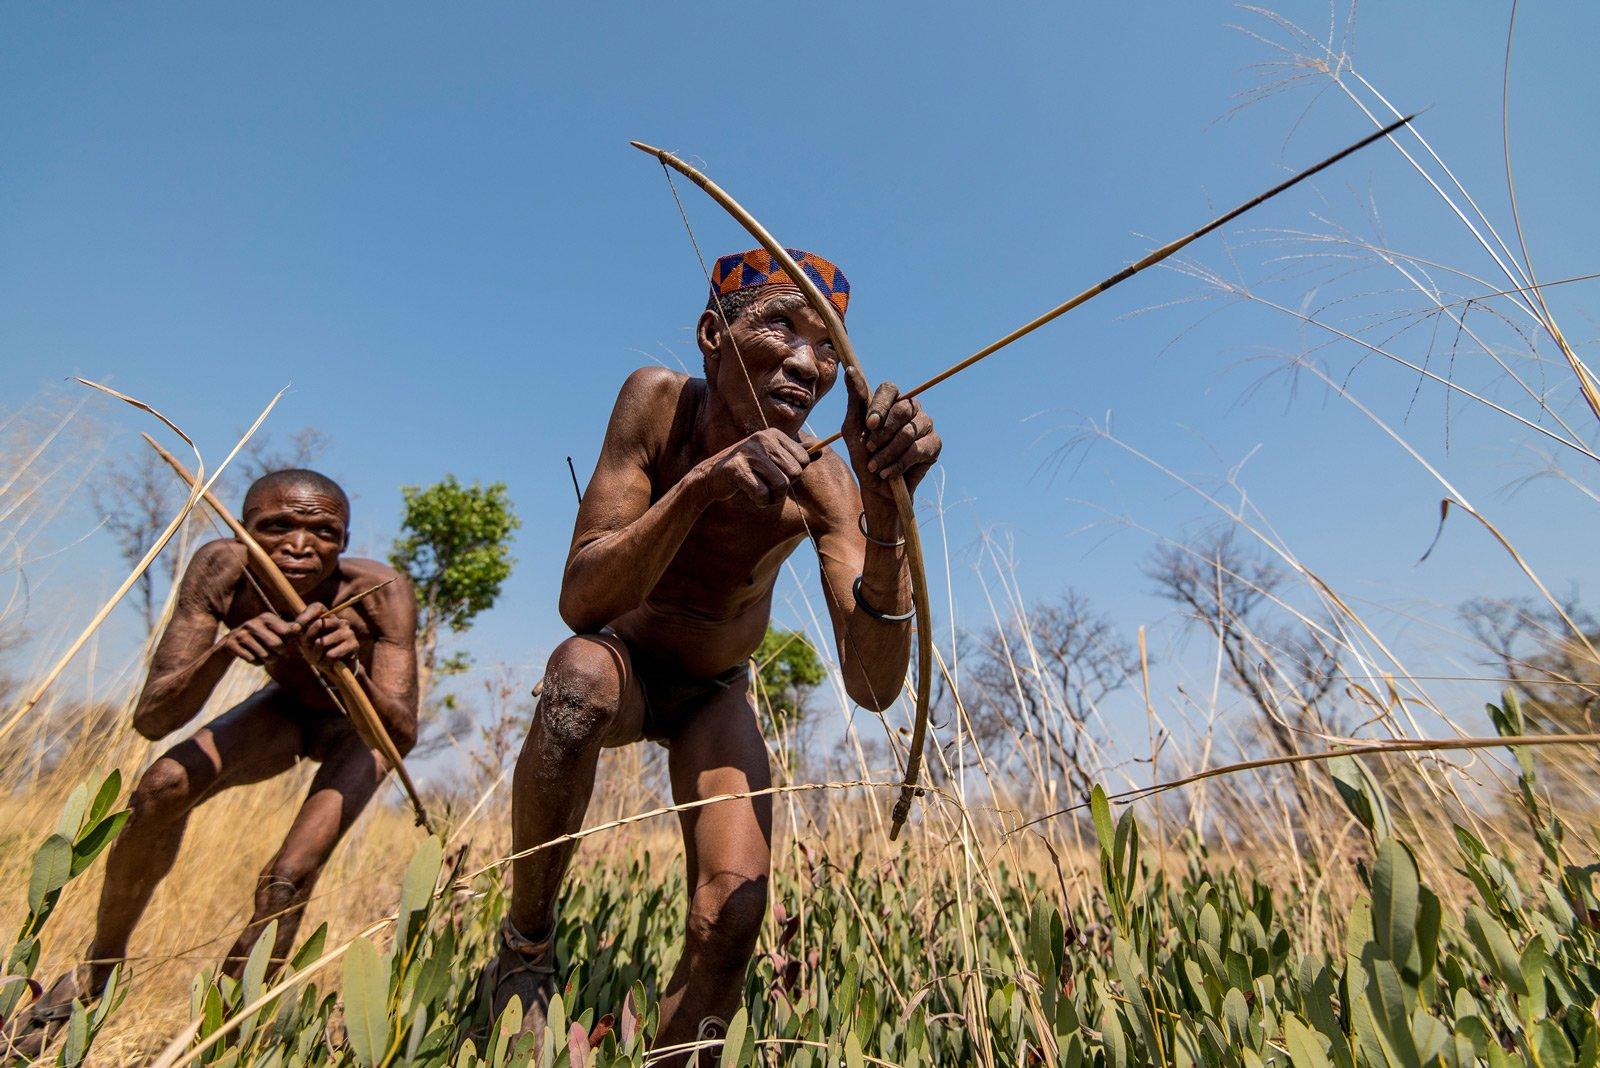 san, san bushmen, hunting